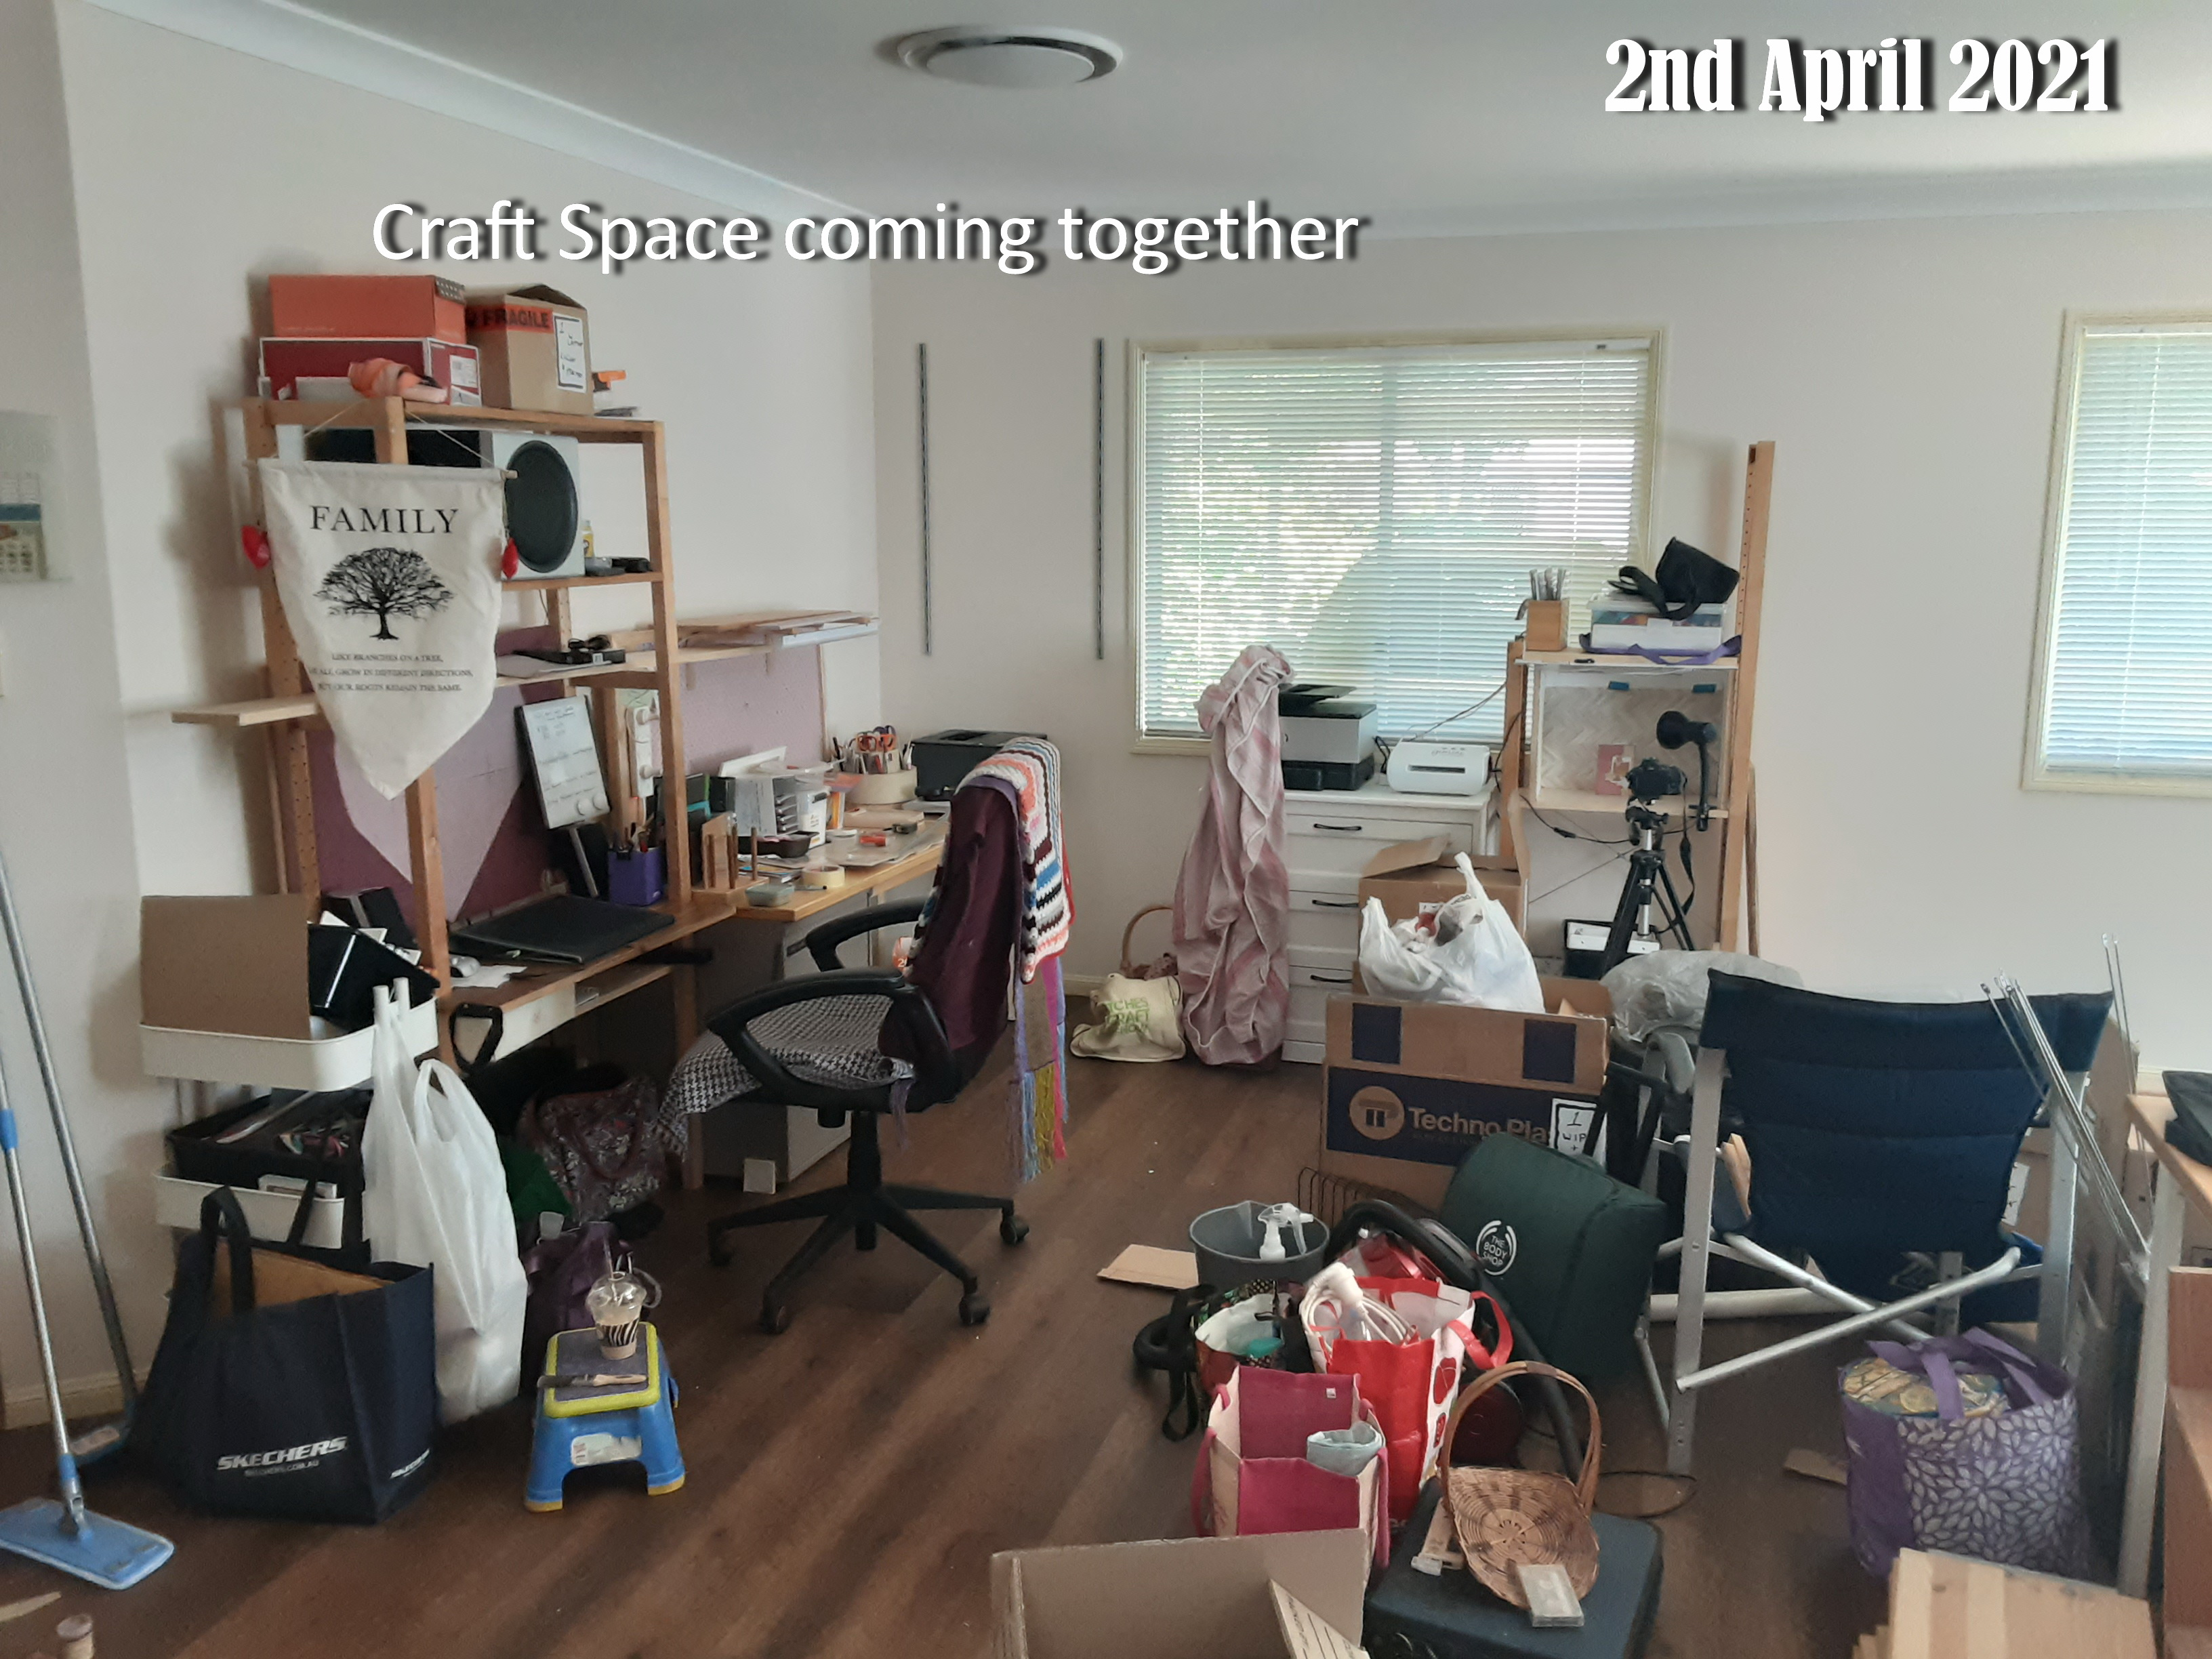 craft space 2 April 2021